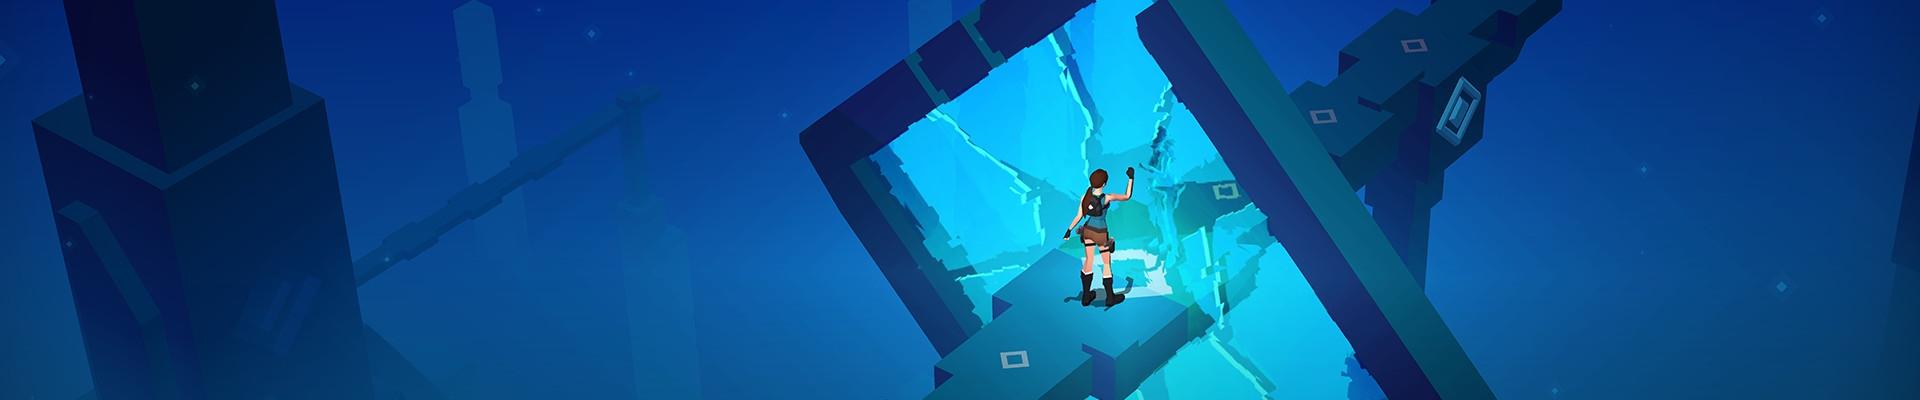 Image de l'article LCGO : The Mirror of Spirits disponible sur Steam